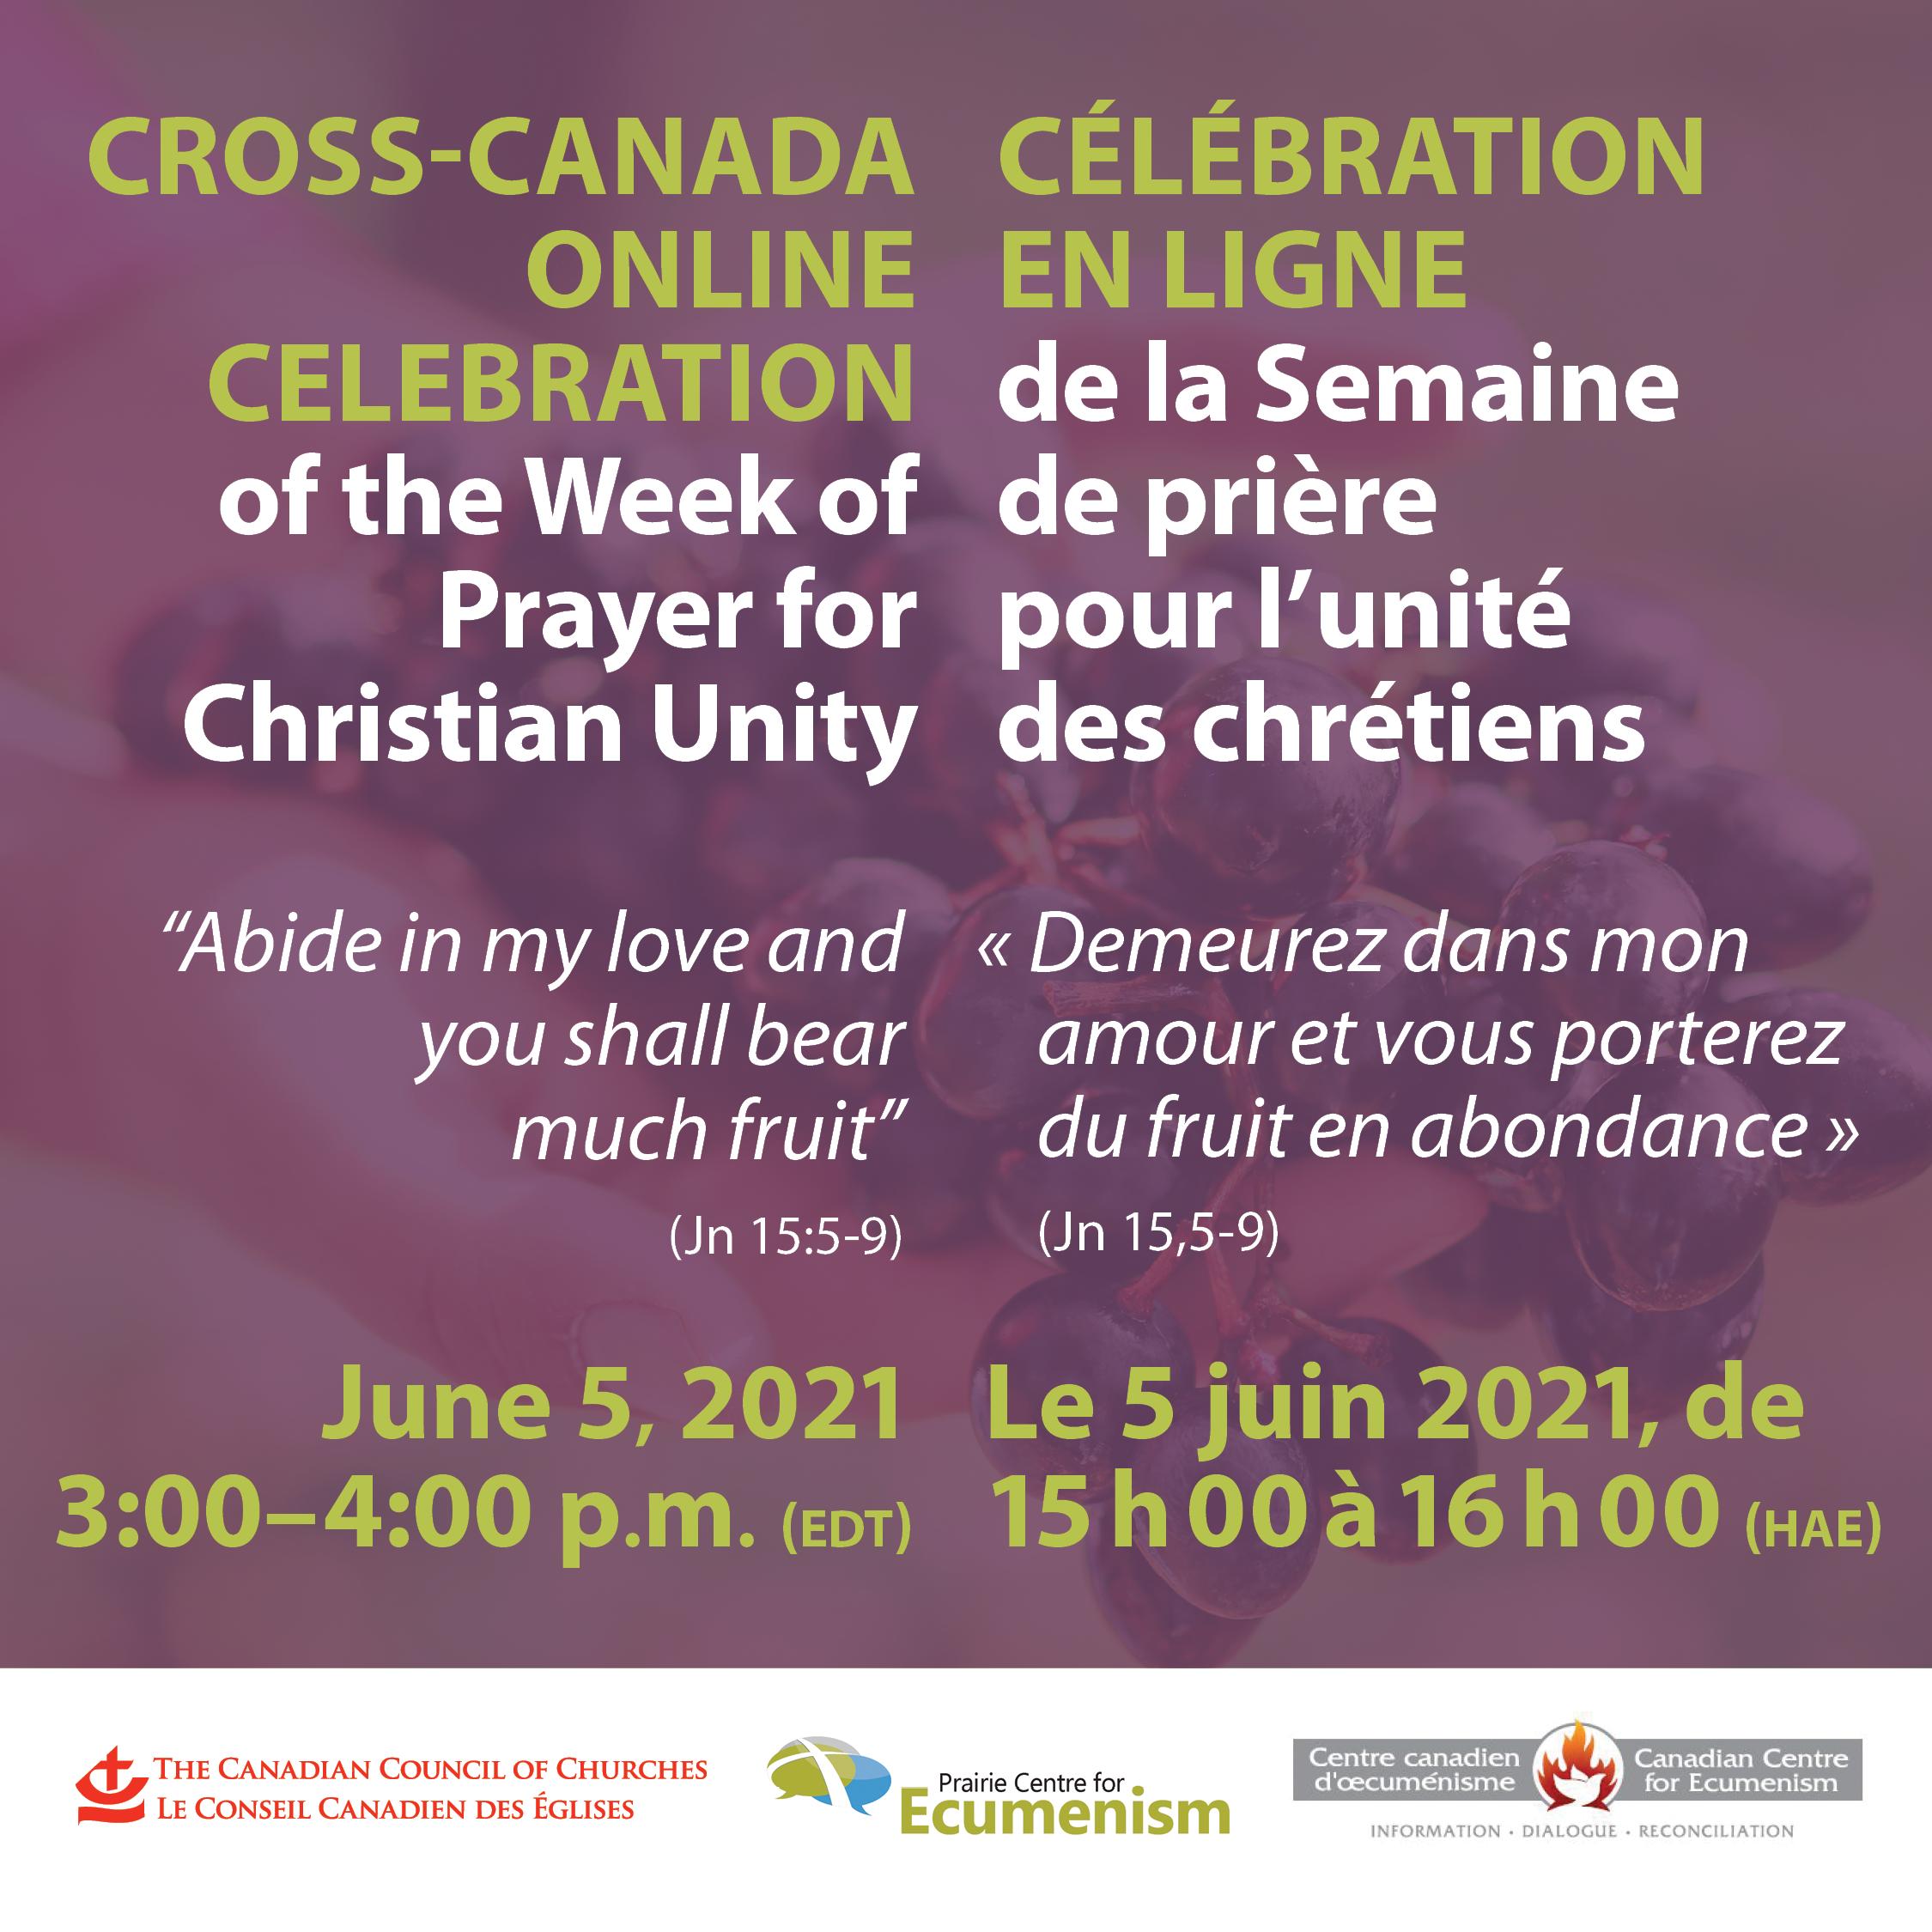 Online Celebration of the Week of Prayer for Christian Unity